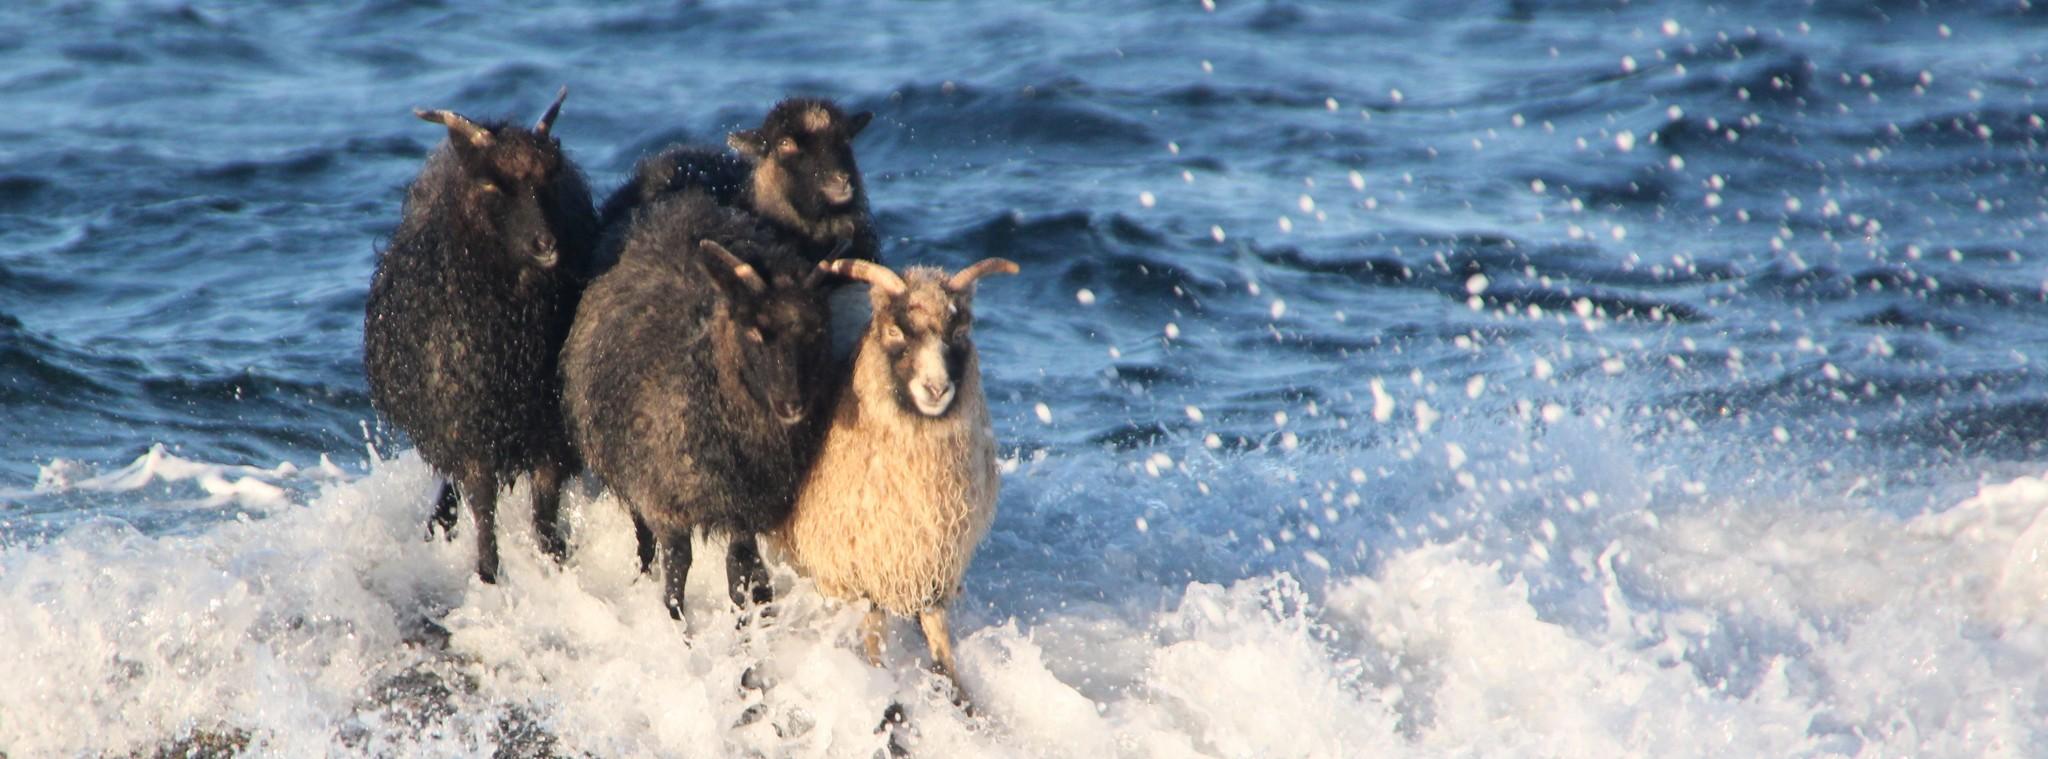 sheep stranded